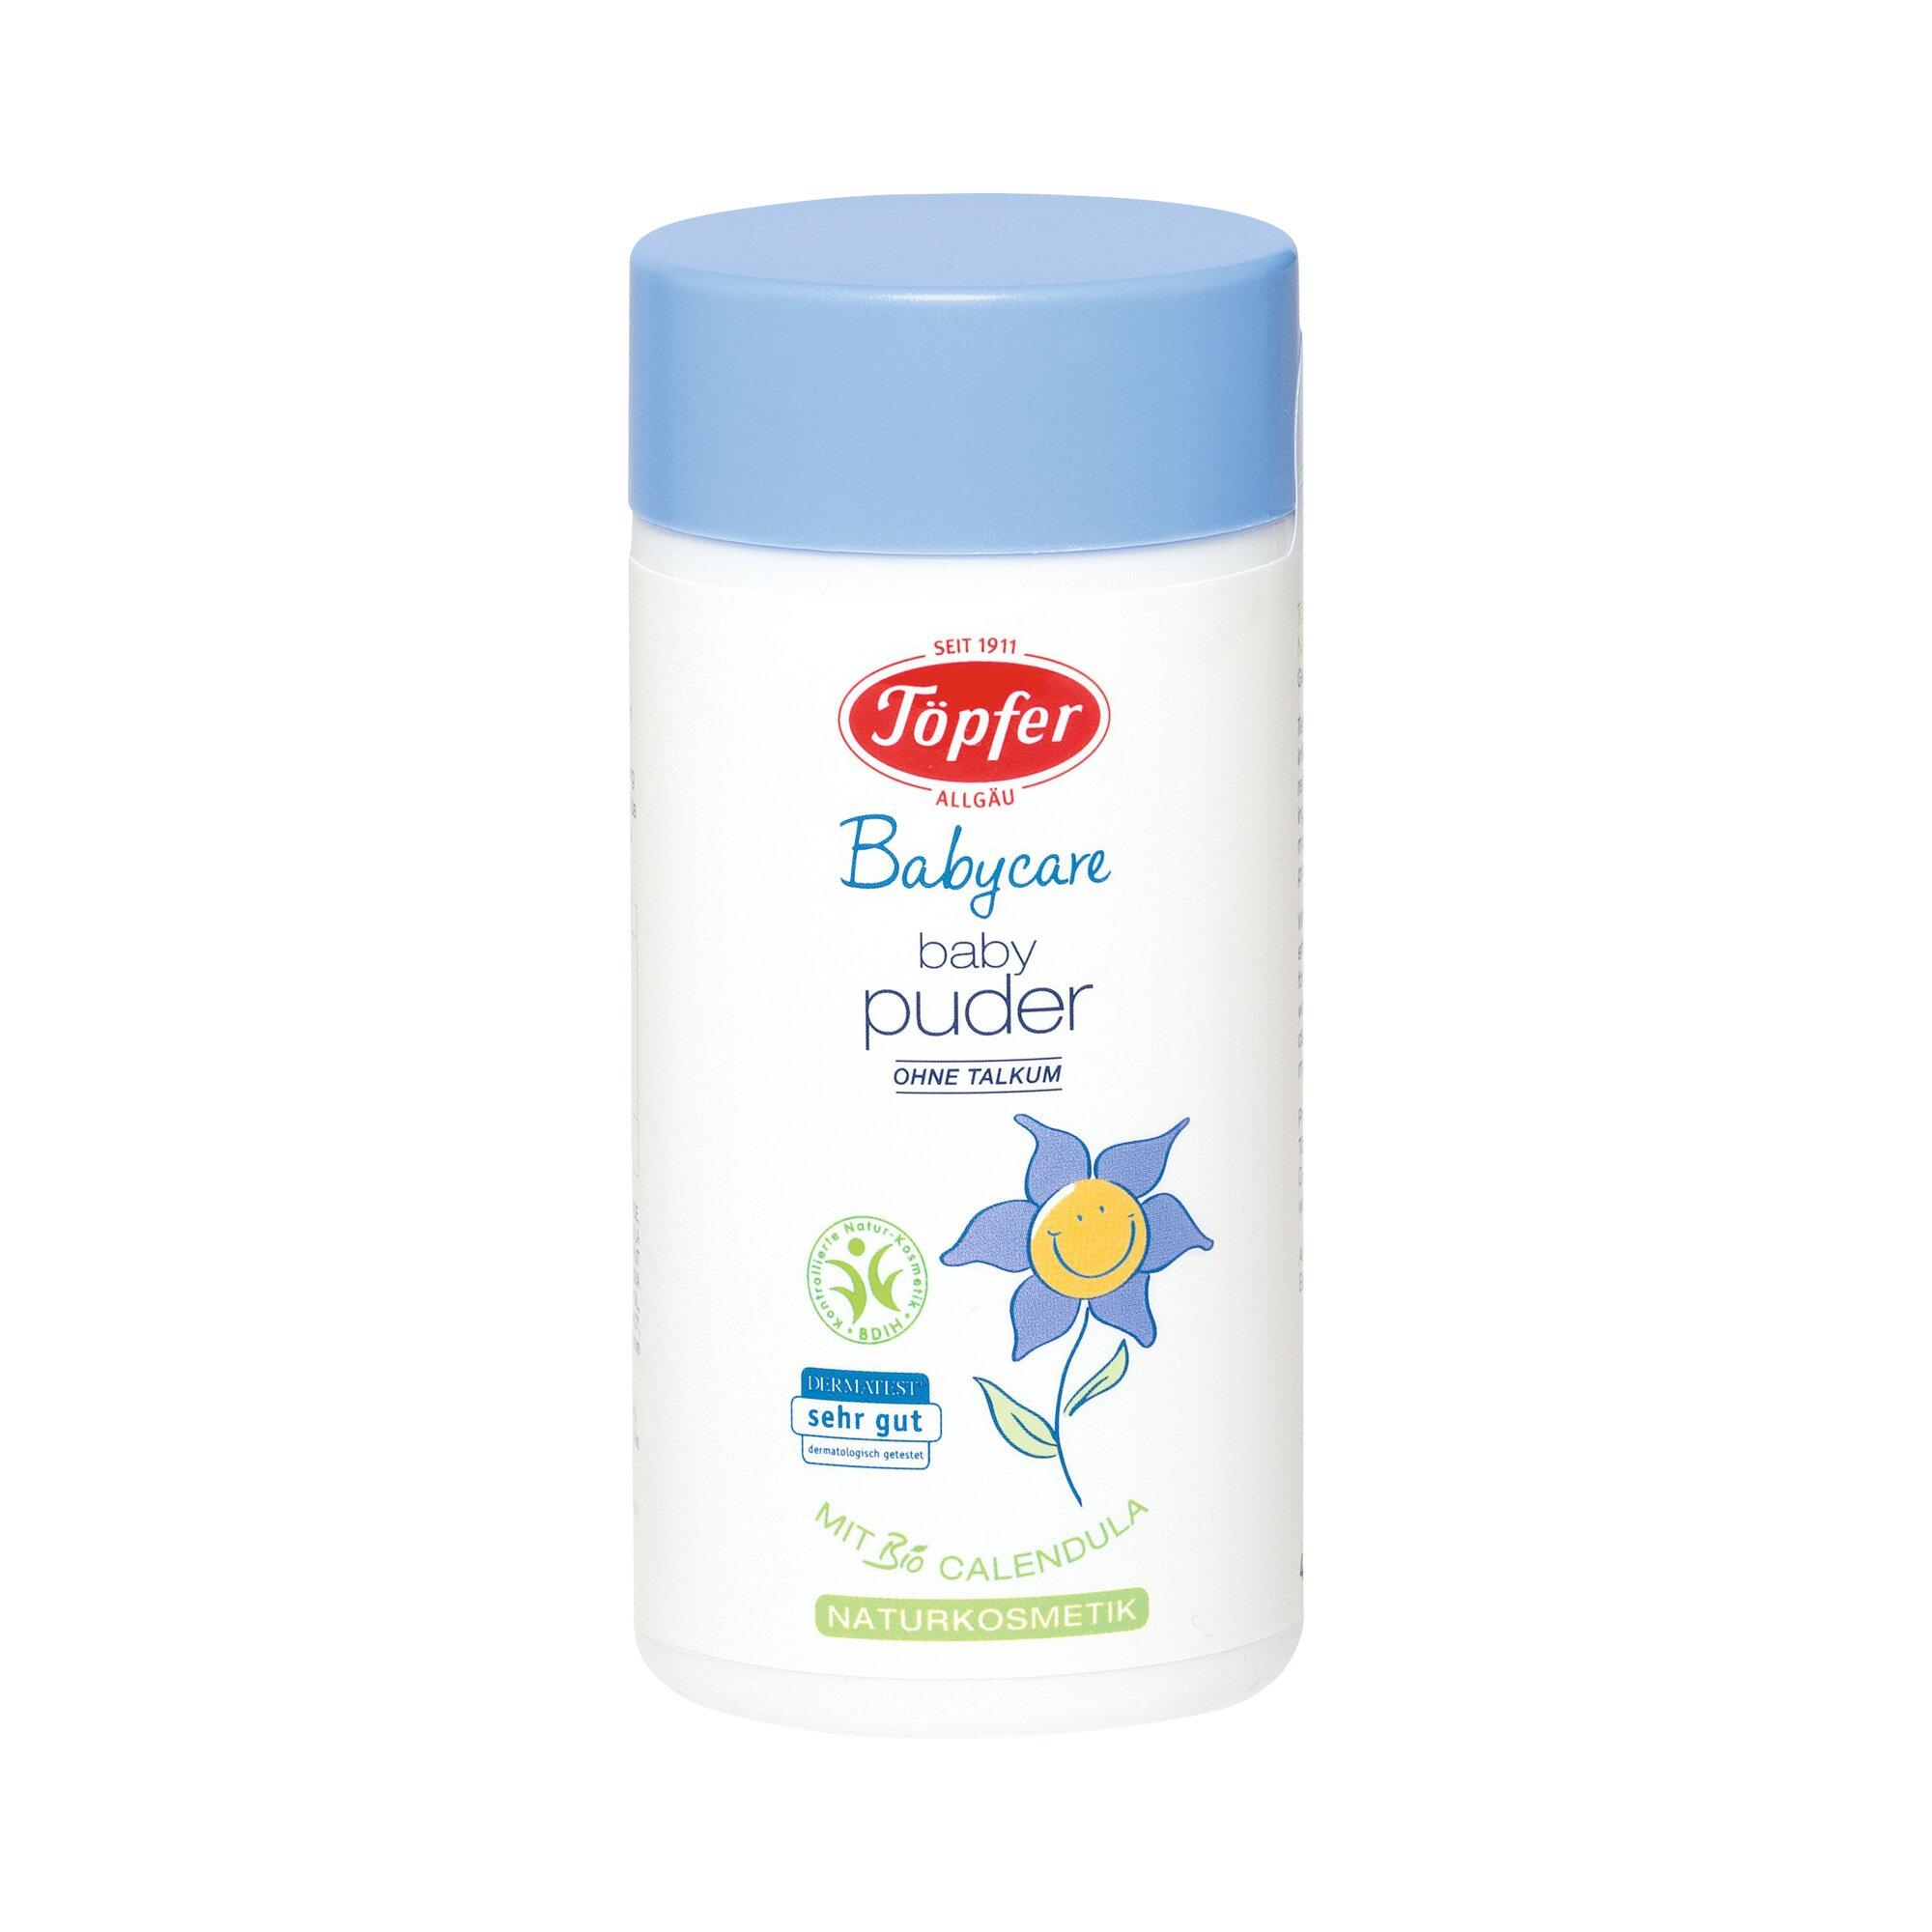 Babycare Puder 75 g